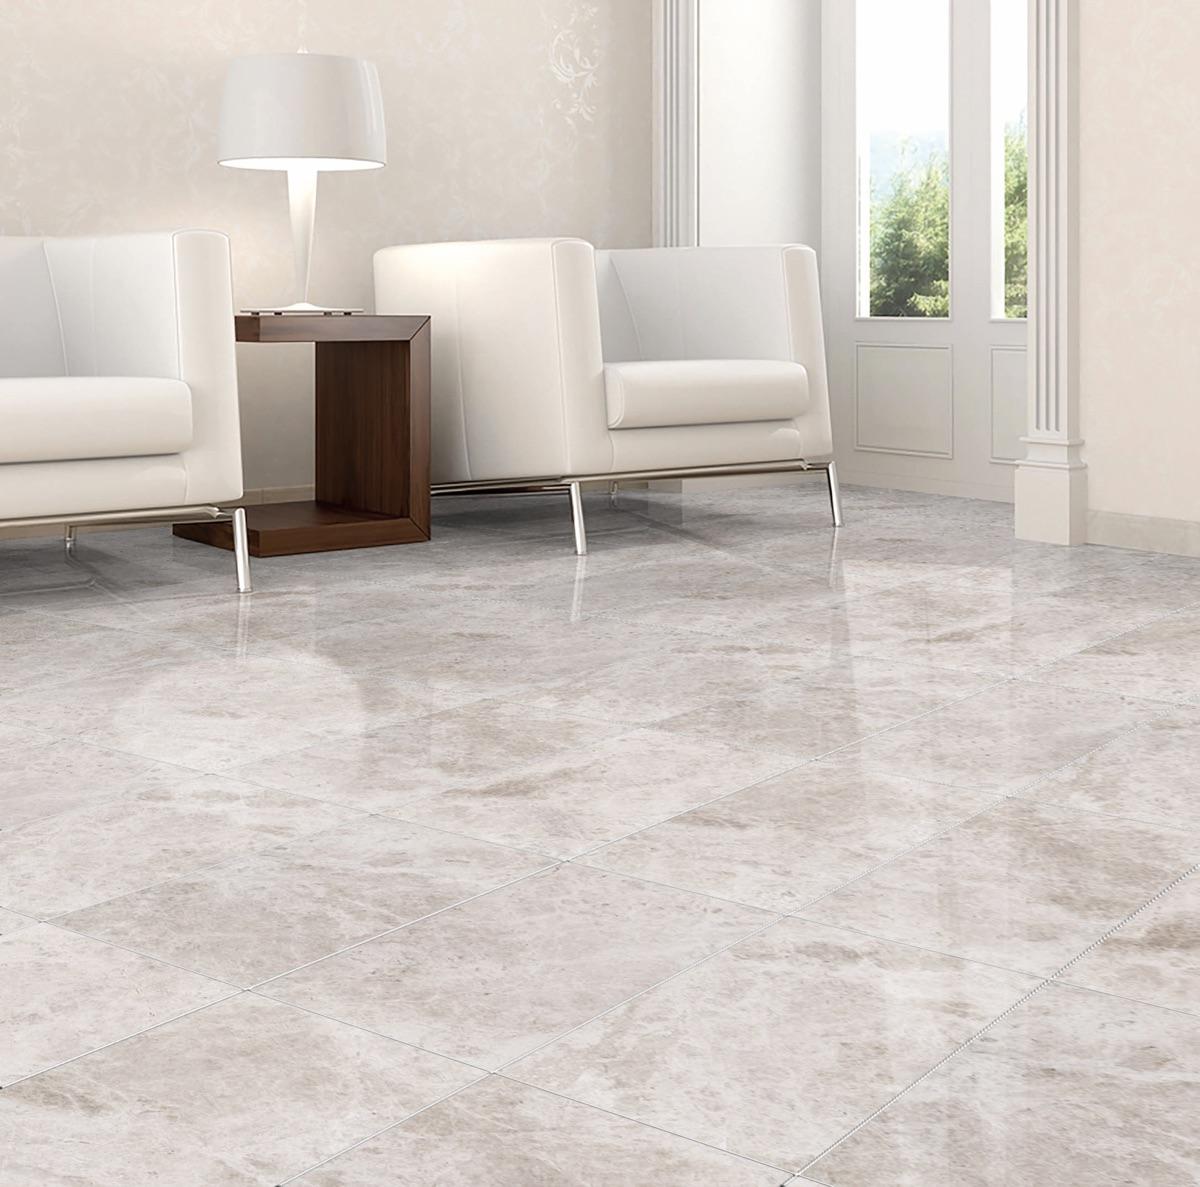 Artmar-MARBLE_Silver-shadow-marble-tiles_Polished-Finish.jpg